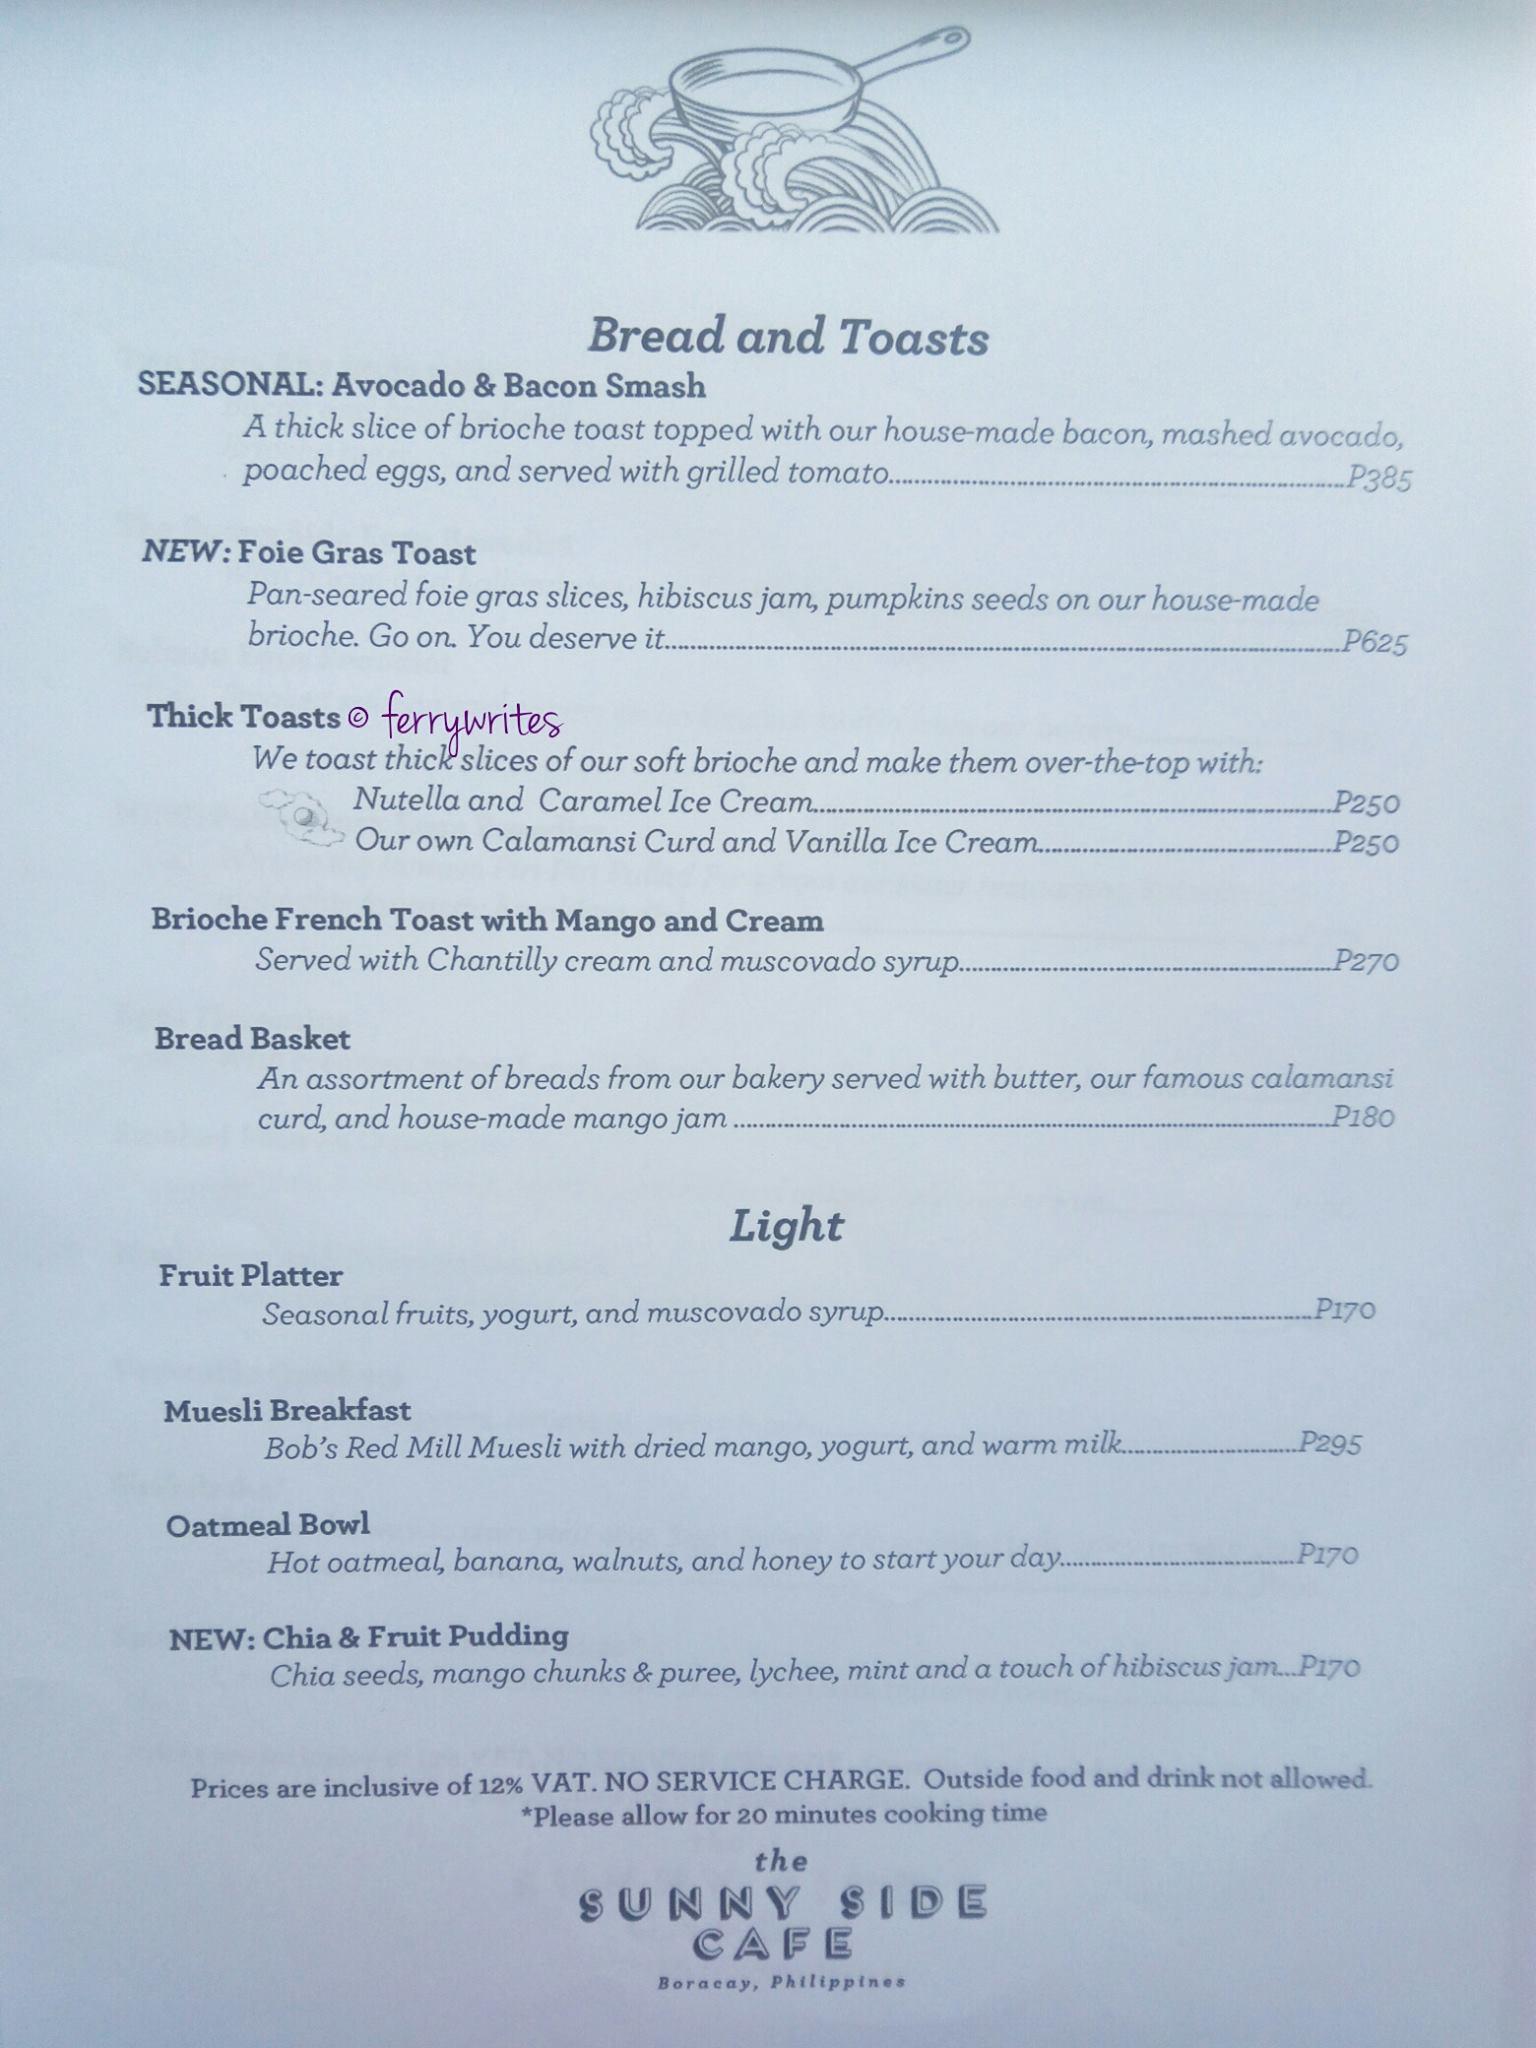 The Sunny Side Cafe Boracay – Ferry Writes